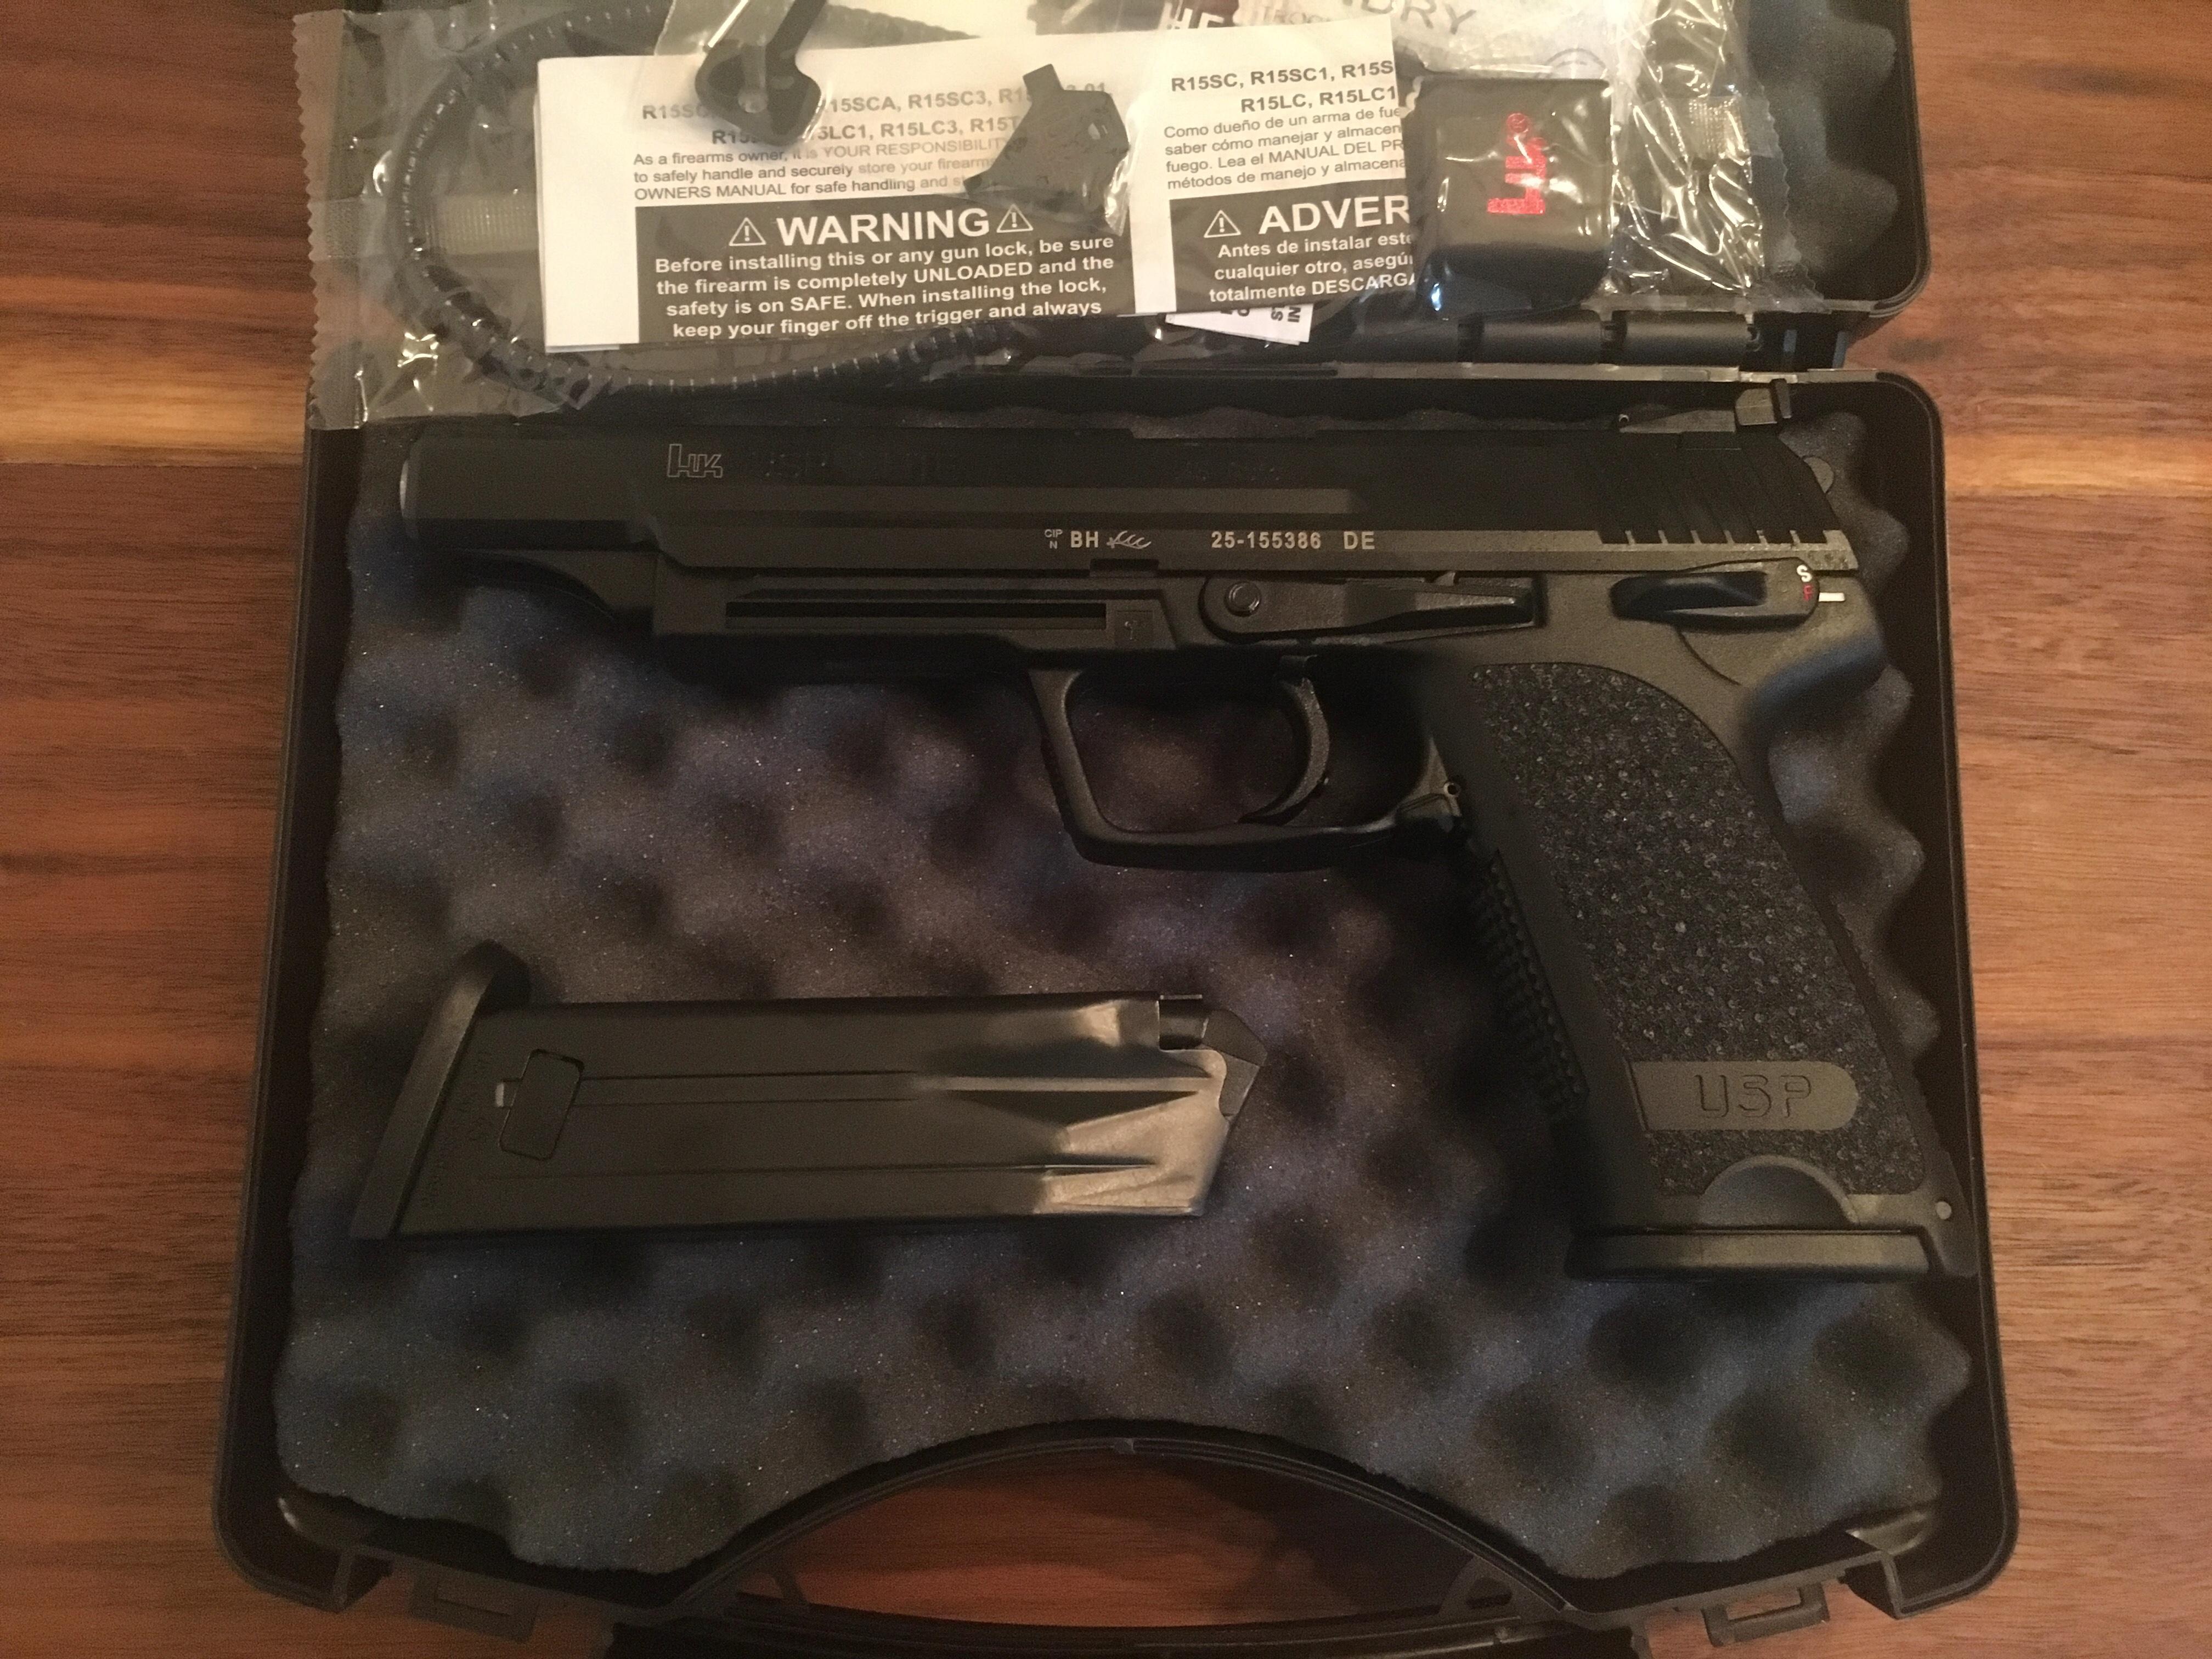 Wts: HK USP Elite .45 NIB 5 shipped!-928975b8-9ba3-442e-b4a6-575a2a81357b.jpeg